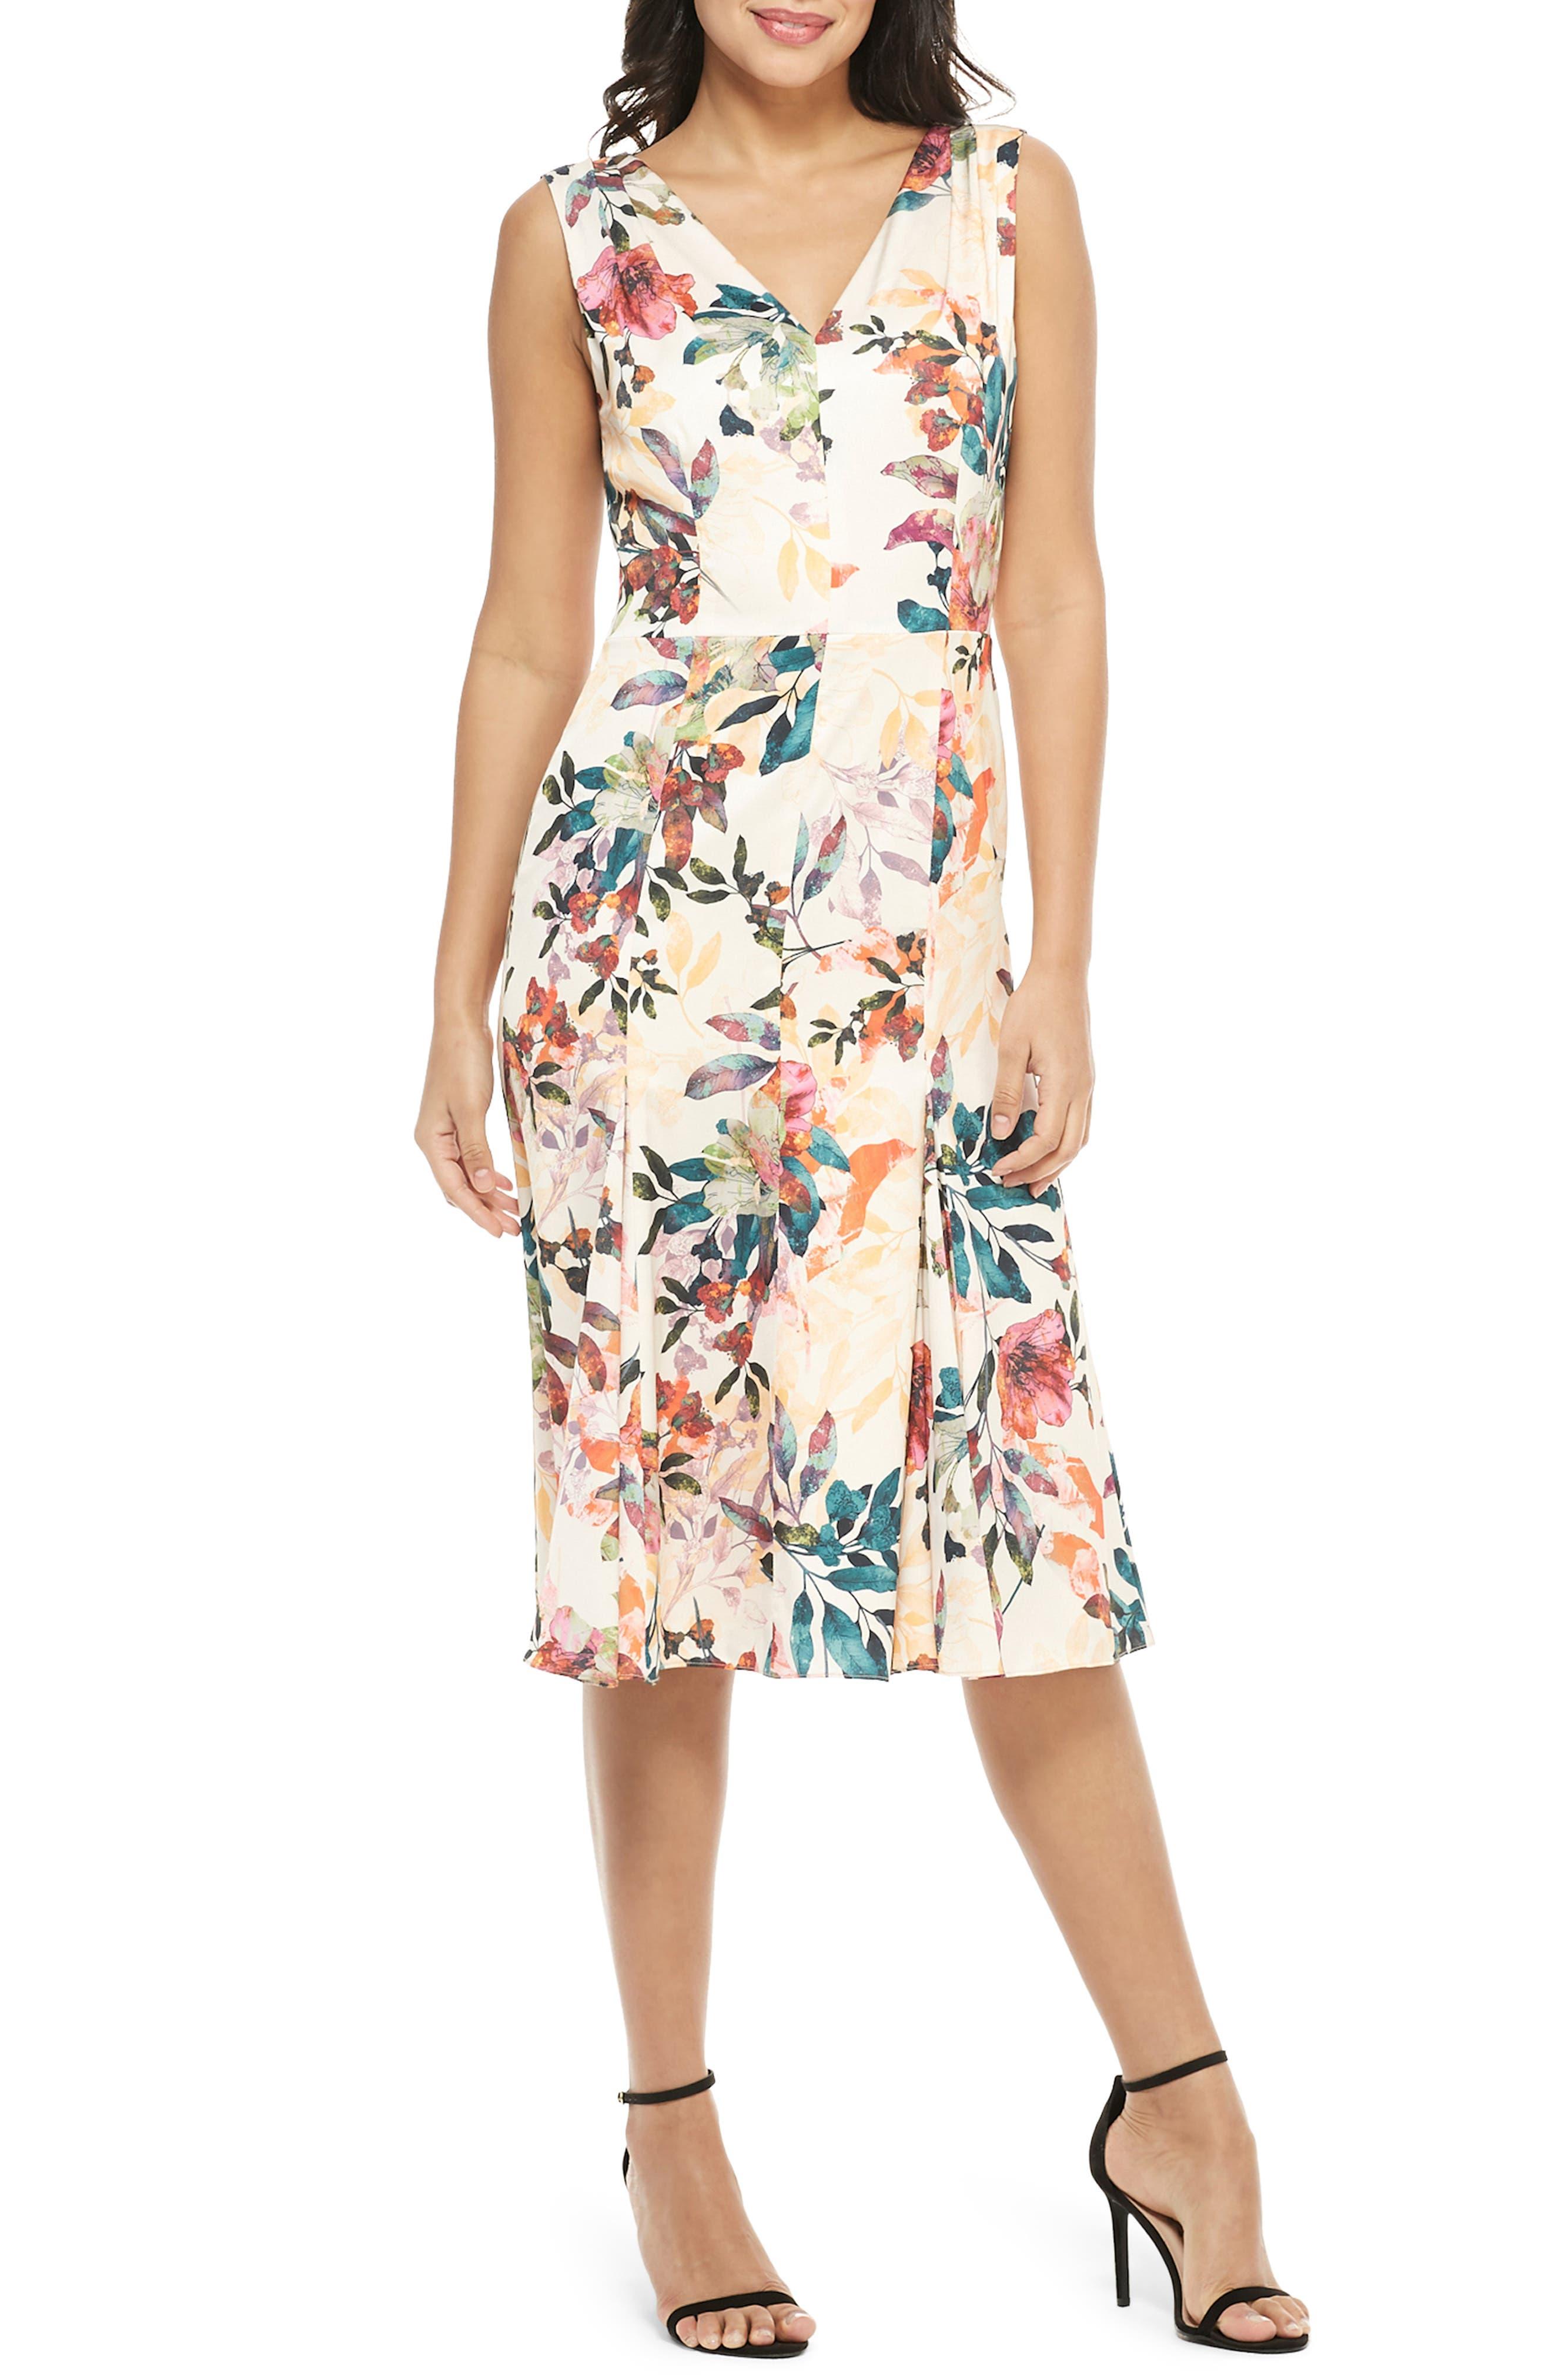 Maggy London Sleeveless Floral Print Charmeuse Dress, Beige